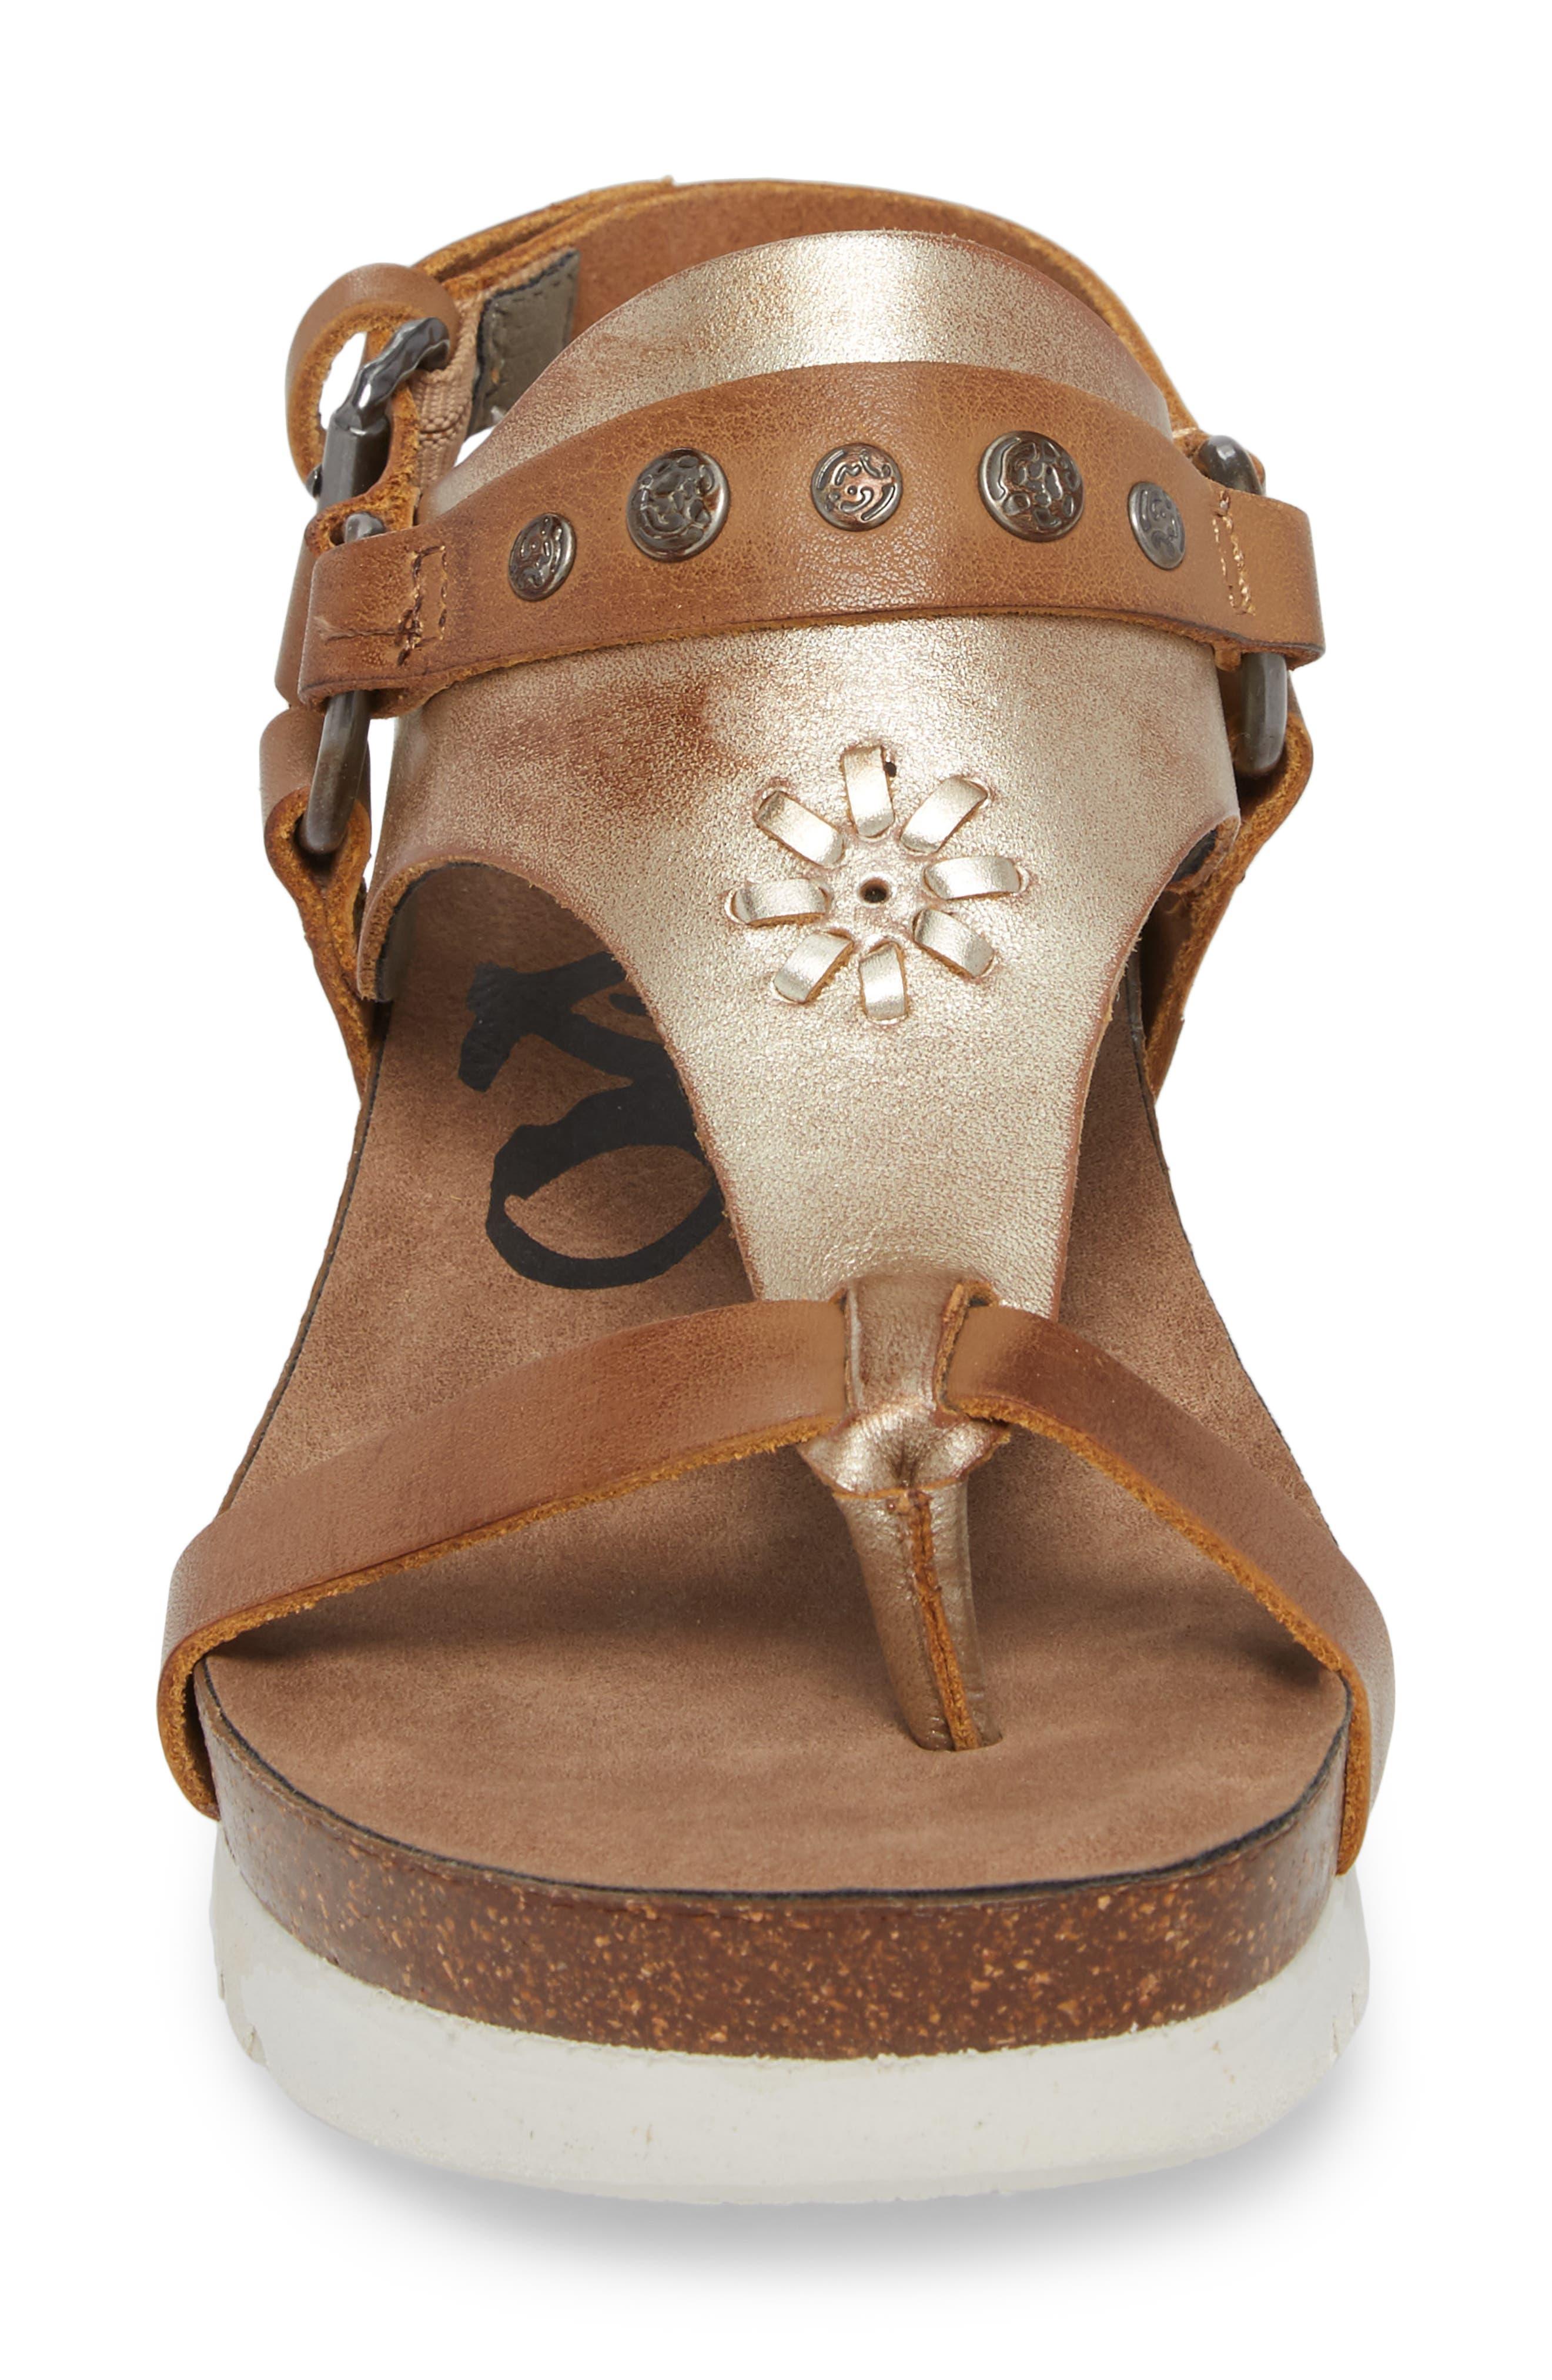 Maverick Wedge Sandal,                             Alternate thumbnail 4, color,                             New Taupe Leather